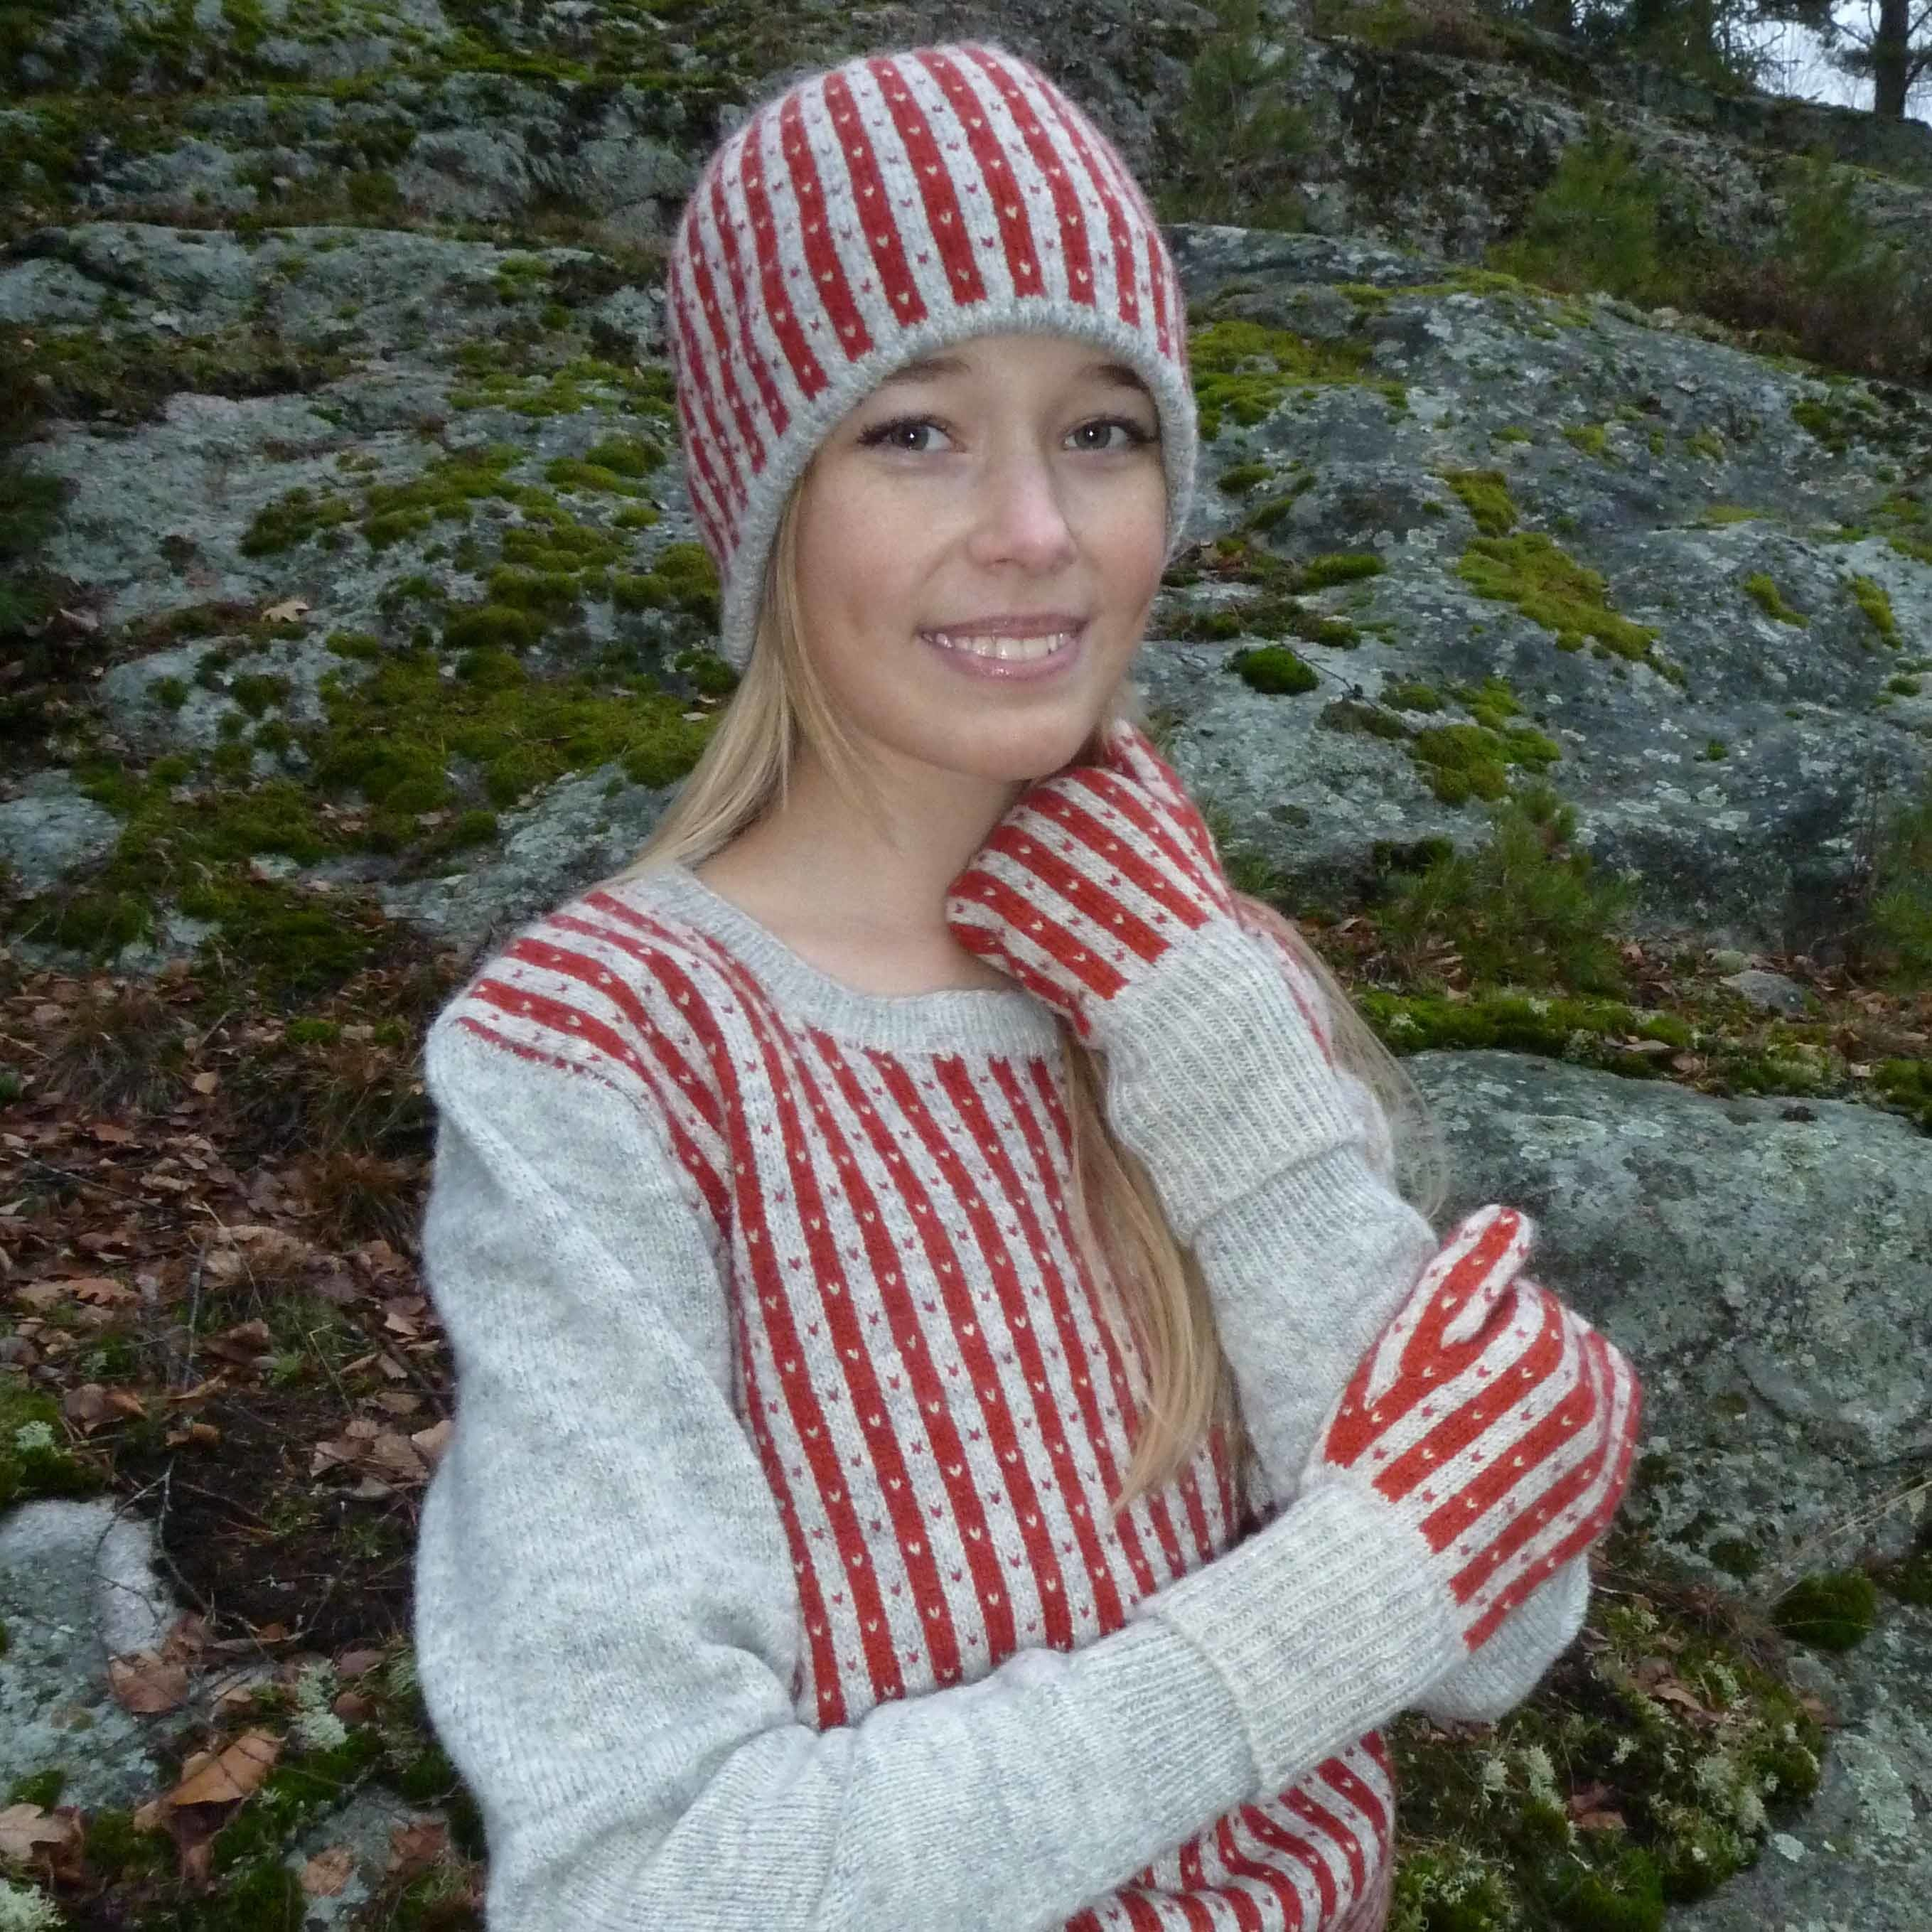 Bohus Stickning Randiga Loppan pullover kit